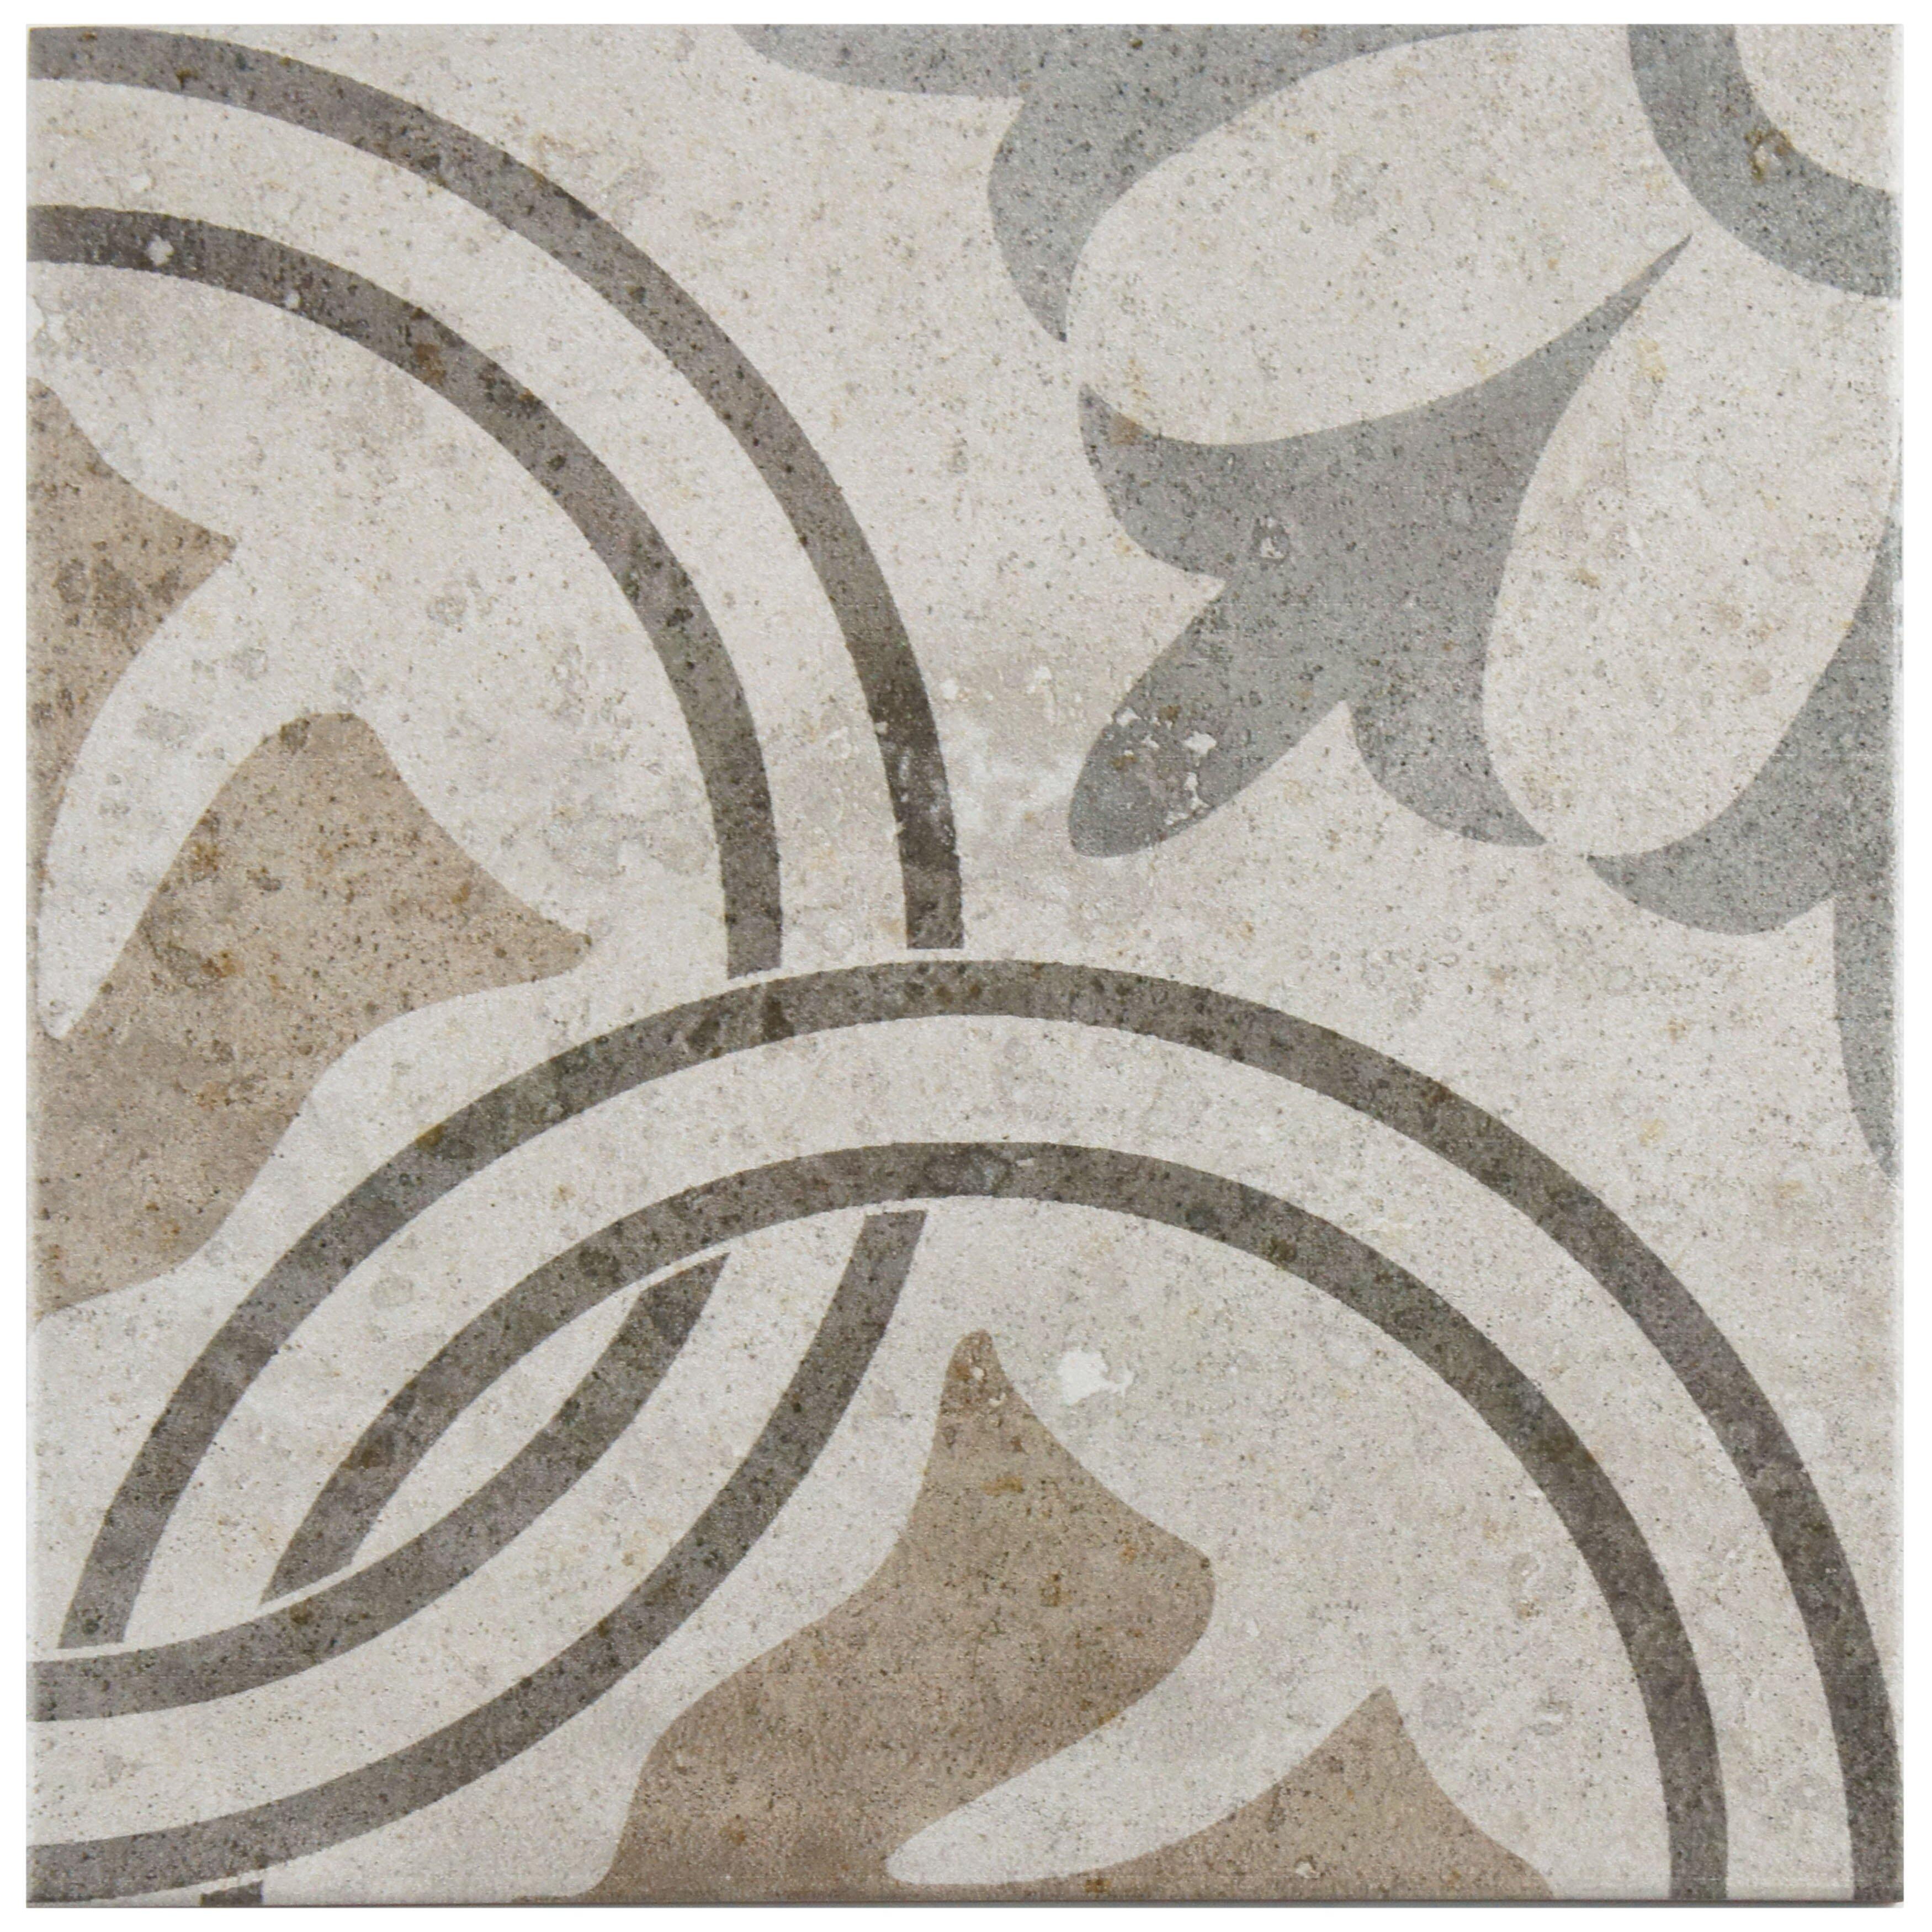 Elitetile ardisana x ceramic field tile in for 13x13 ceramic floor tiles